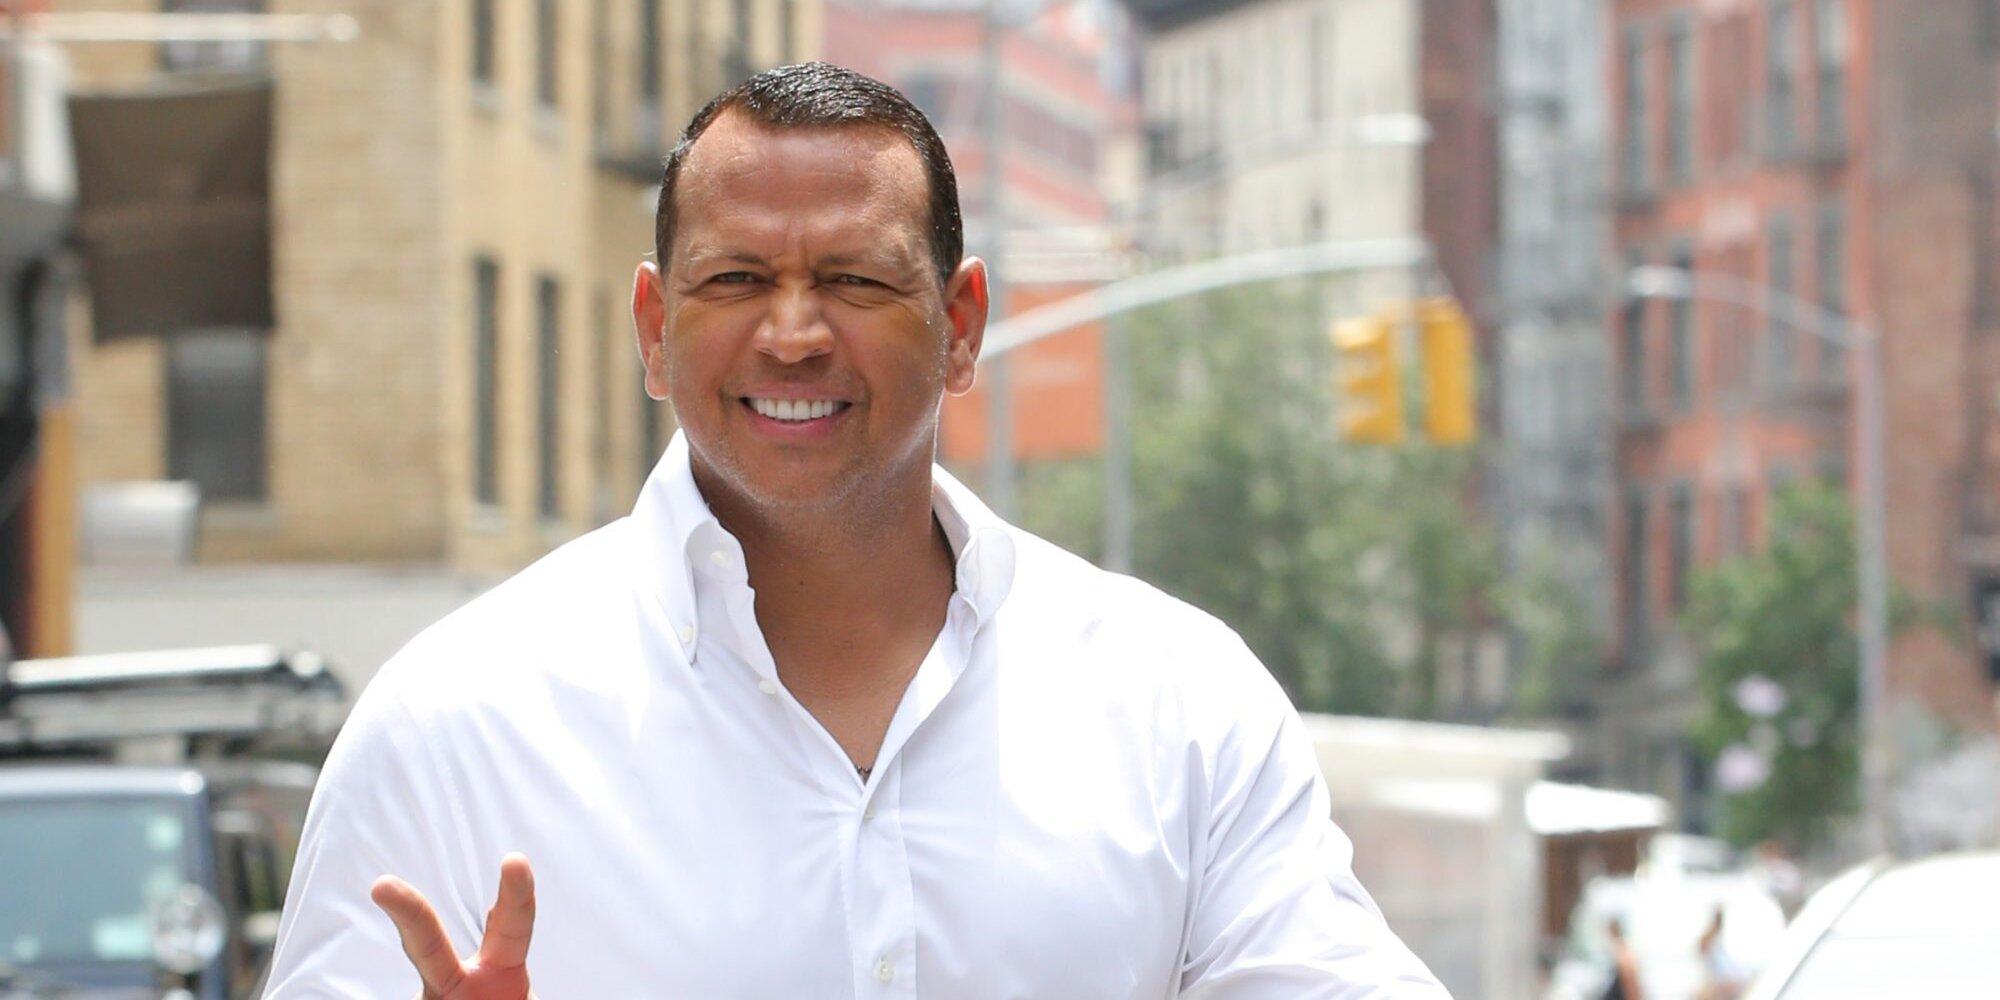 Alex Rodríguez envía fuerte indirecta a una de sus exes ¿A quién se refirió?